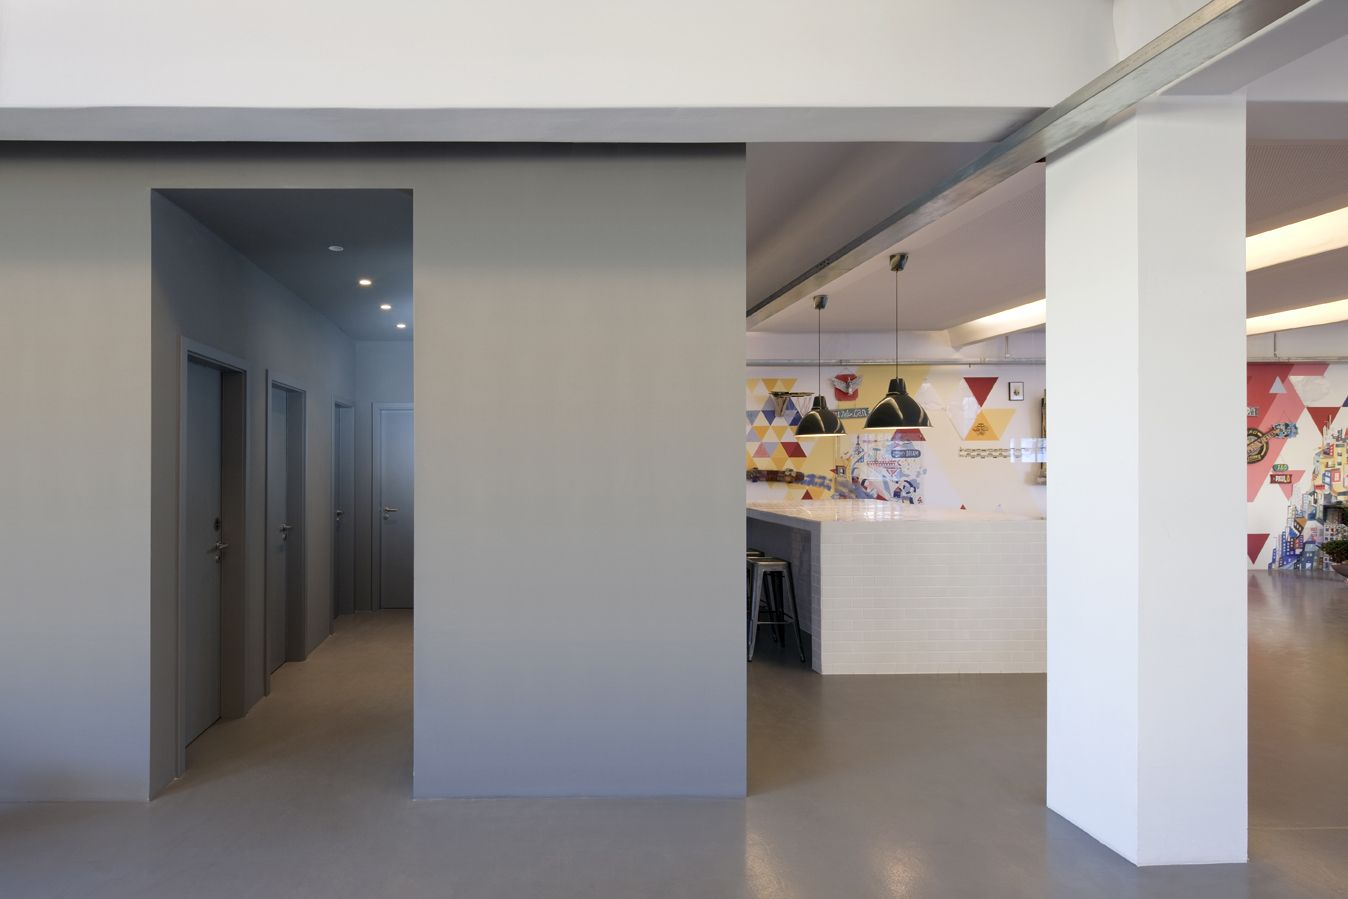 Büro küche design  red bull - berlin - loft style - office - kitchen area - show ...